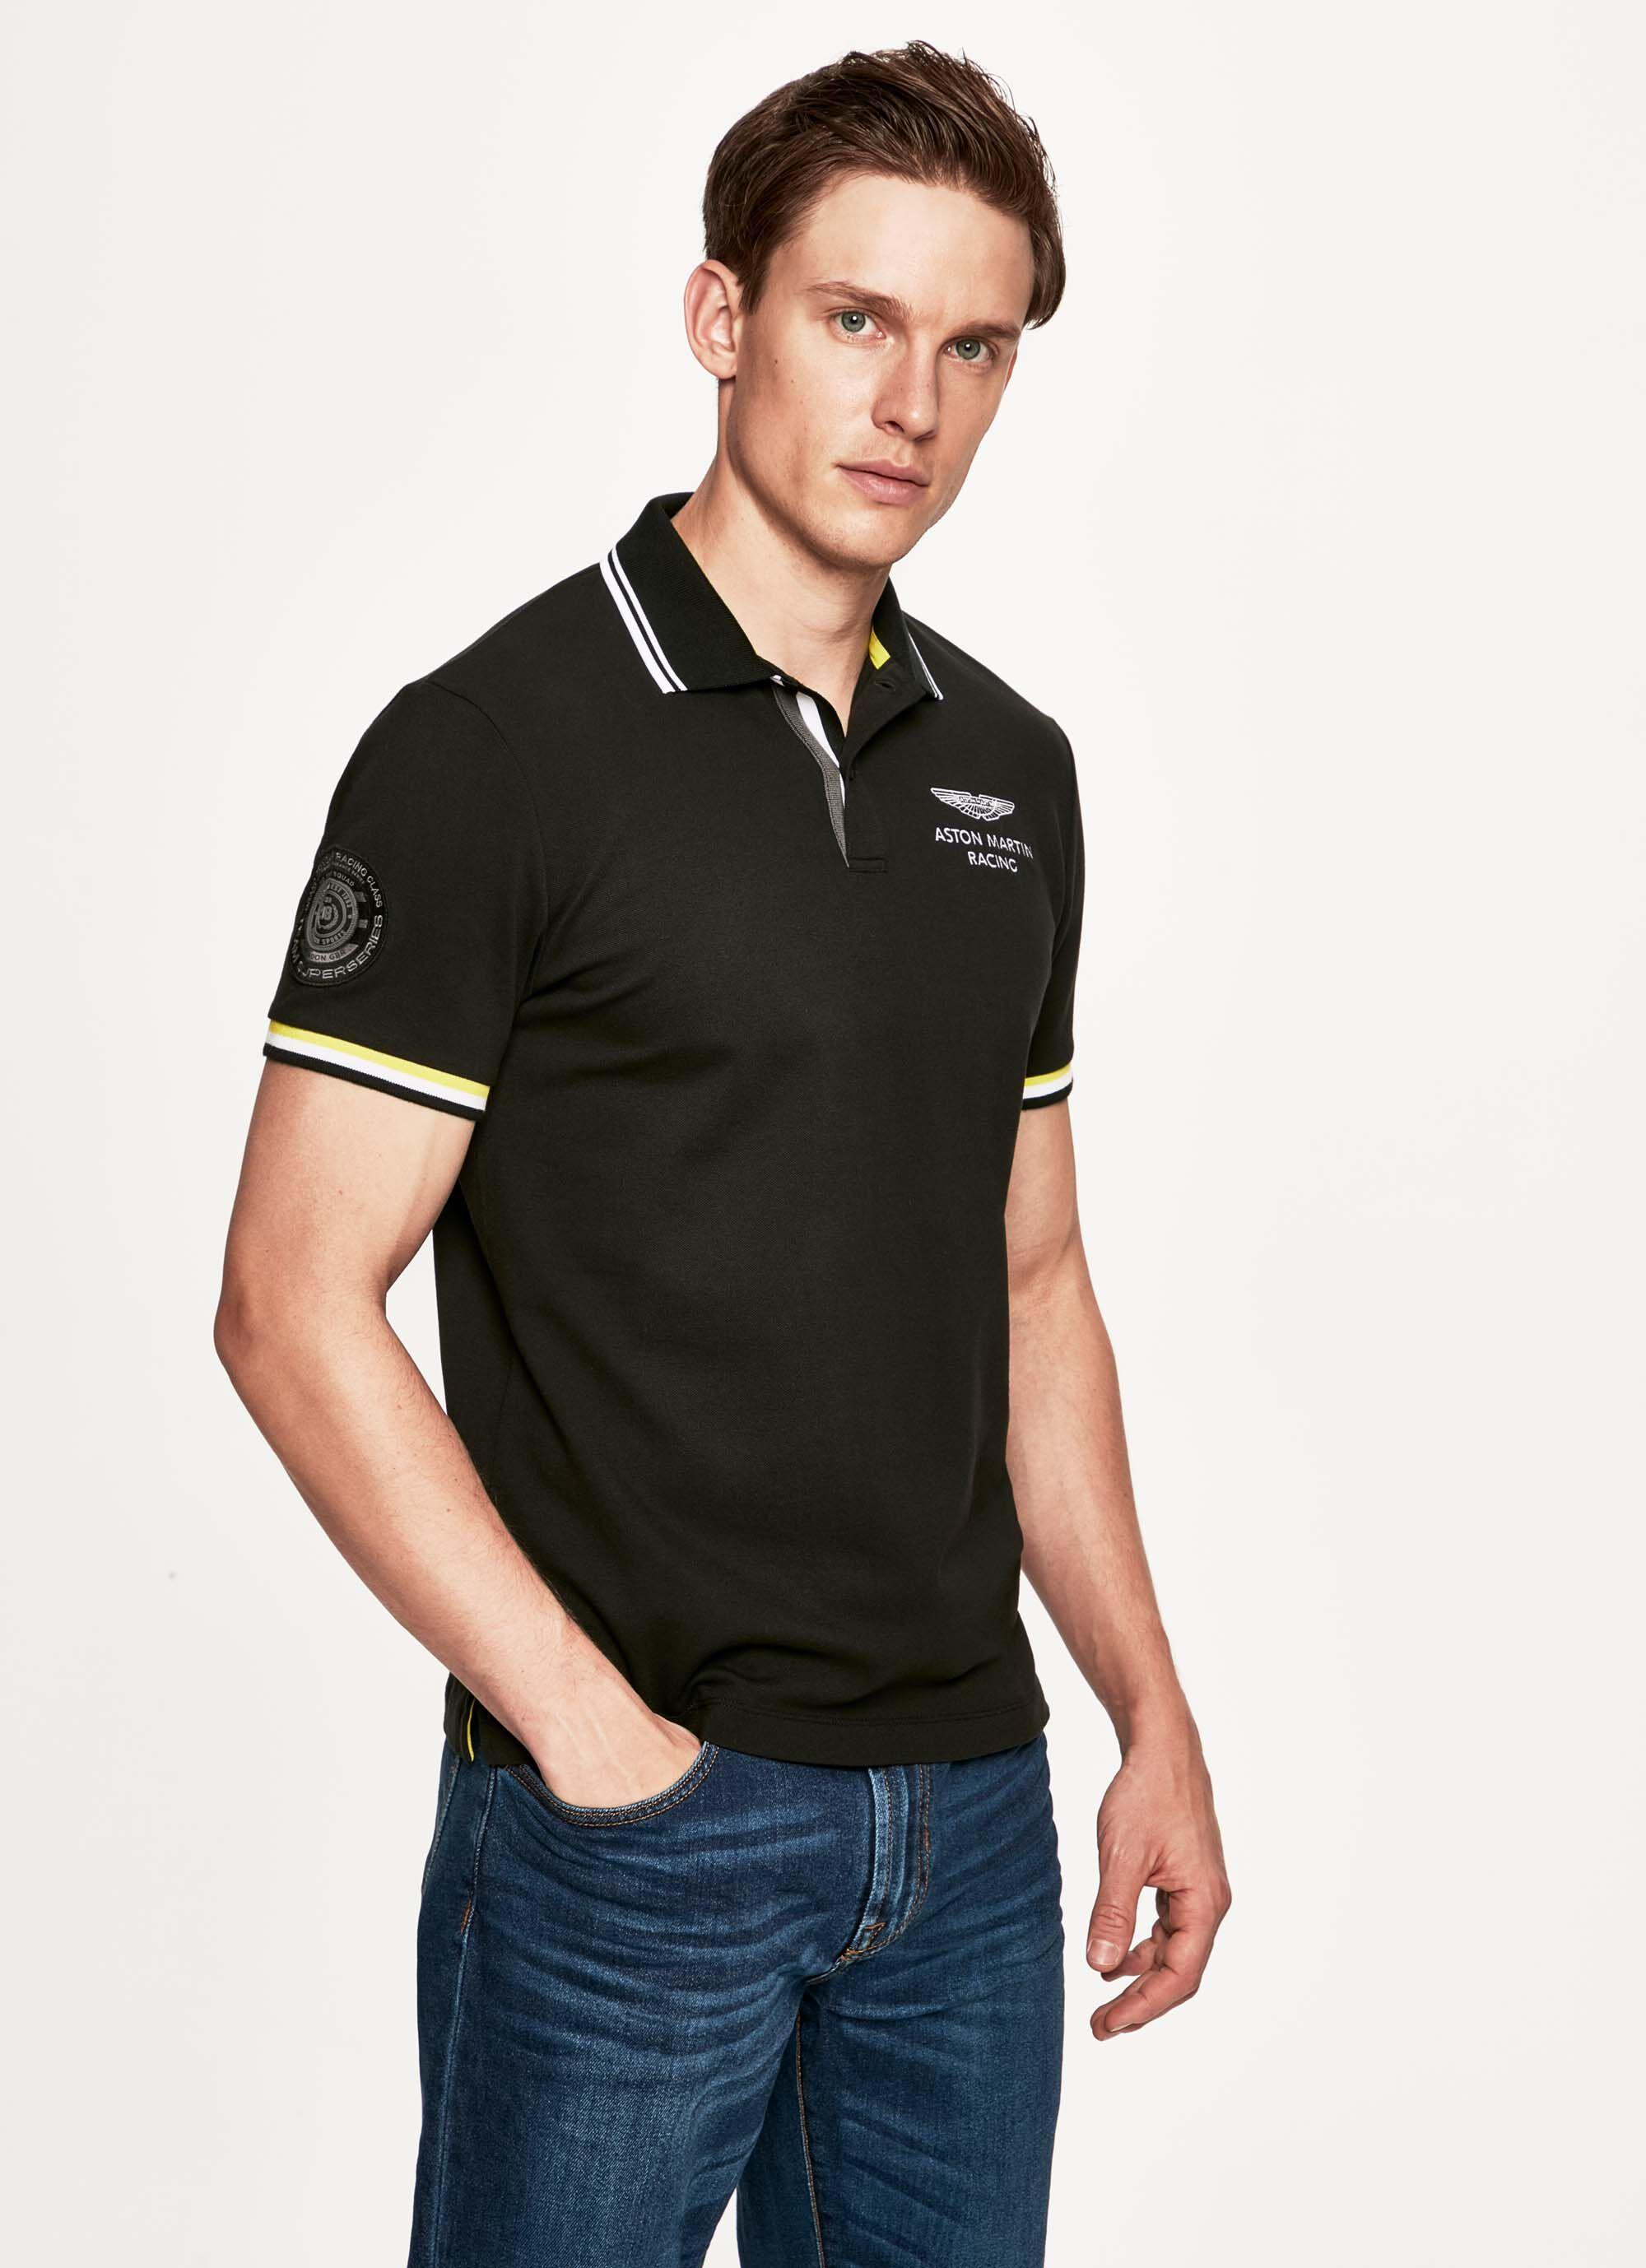 aston martin racing men's striped trim detail stretch cotton short-sleeved polo shirt | x-small | black